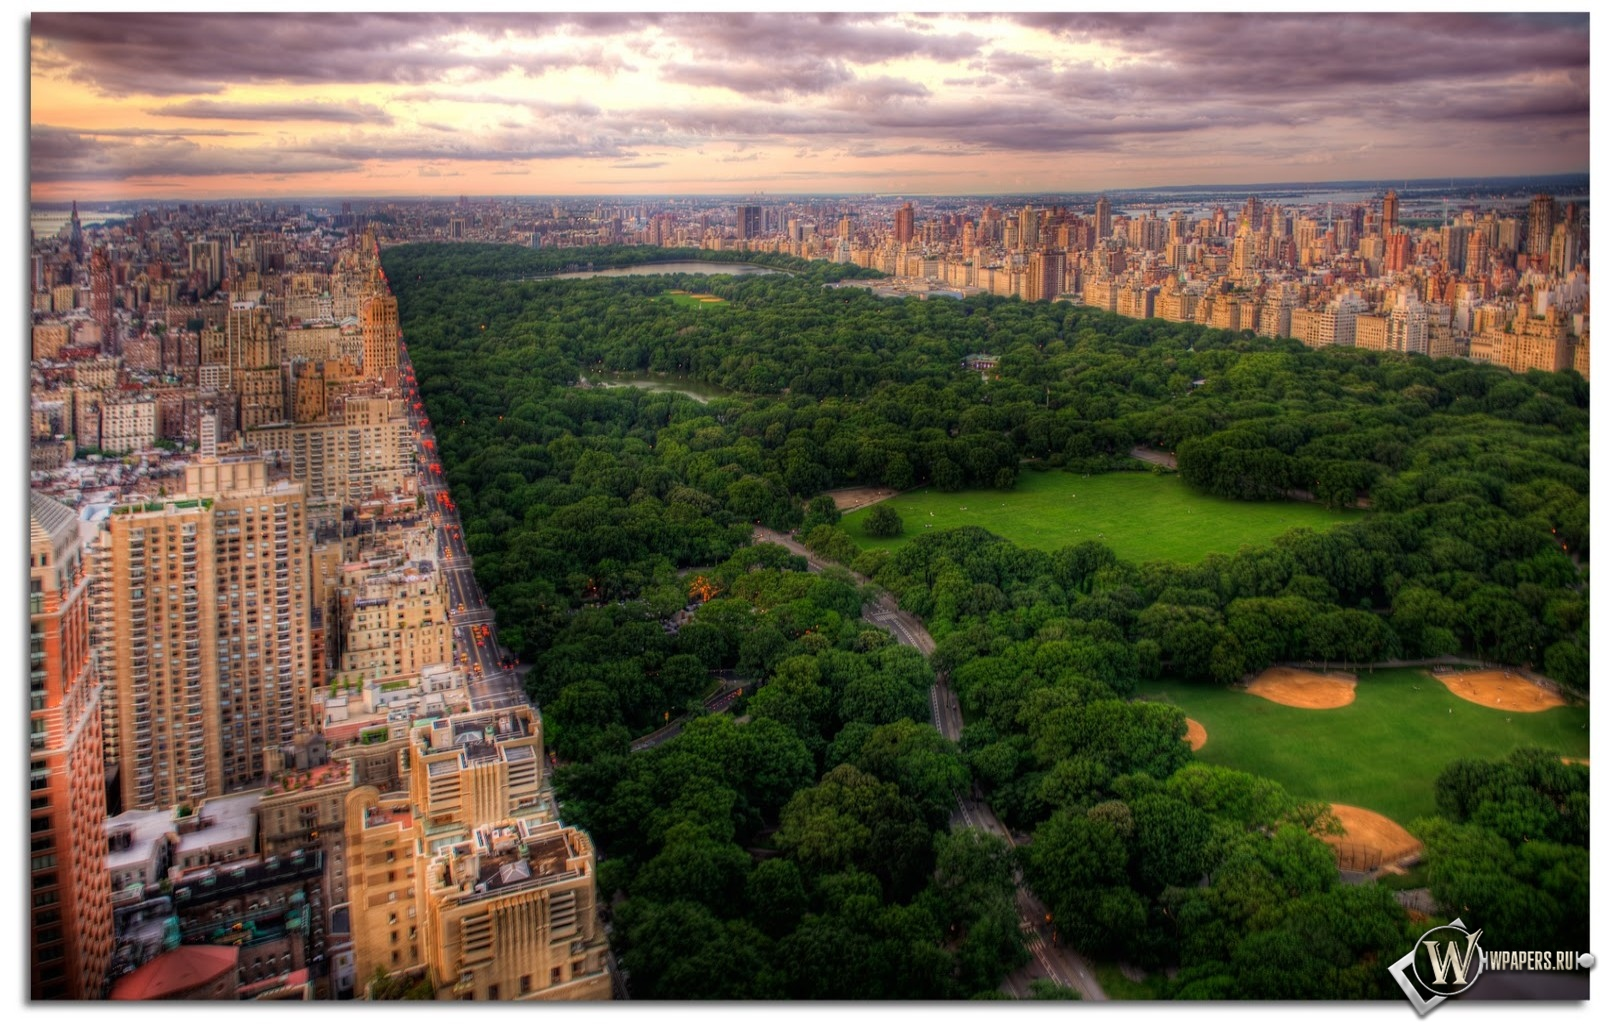 Центральный парк (Нью-Йорк) 1600x1024